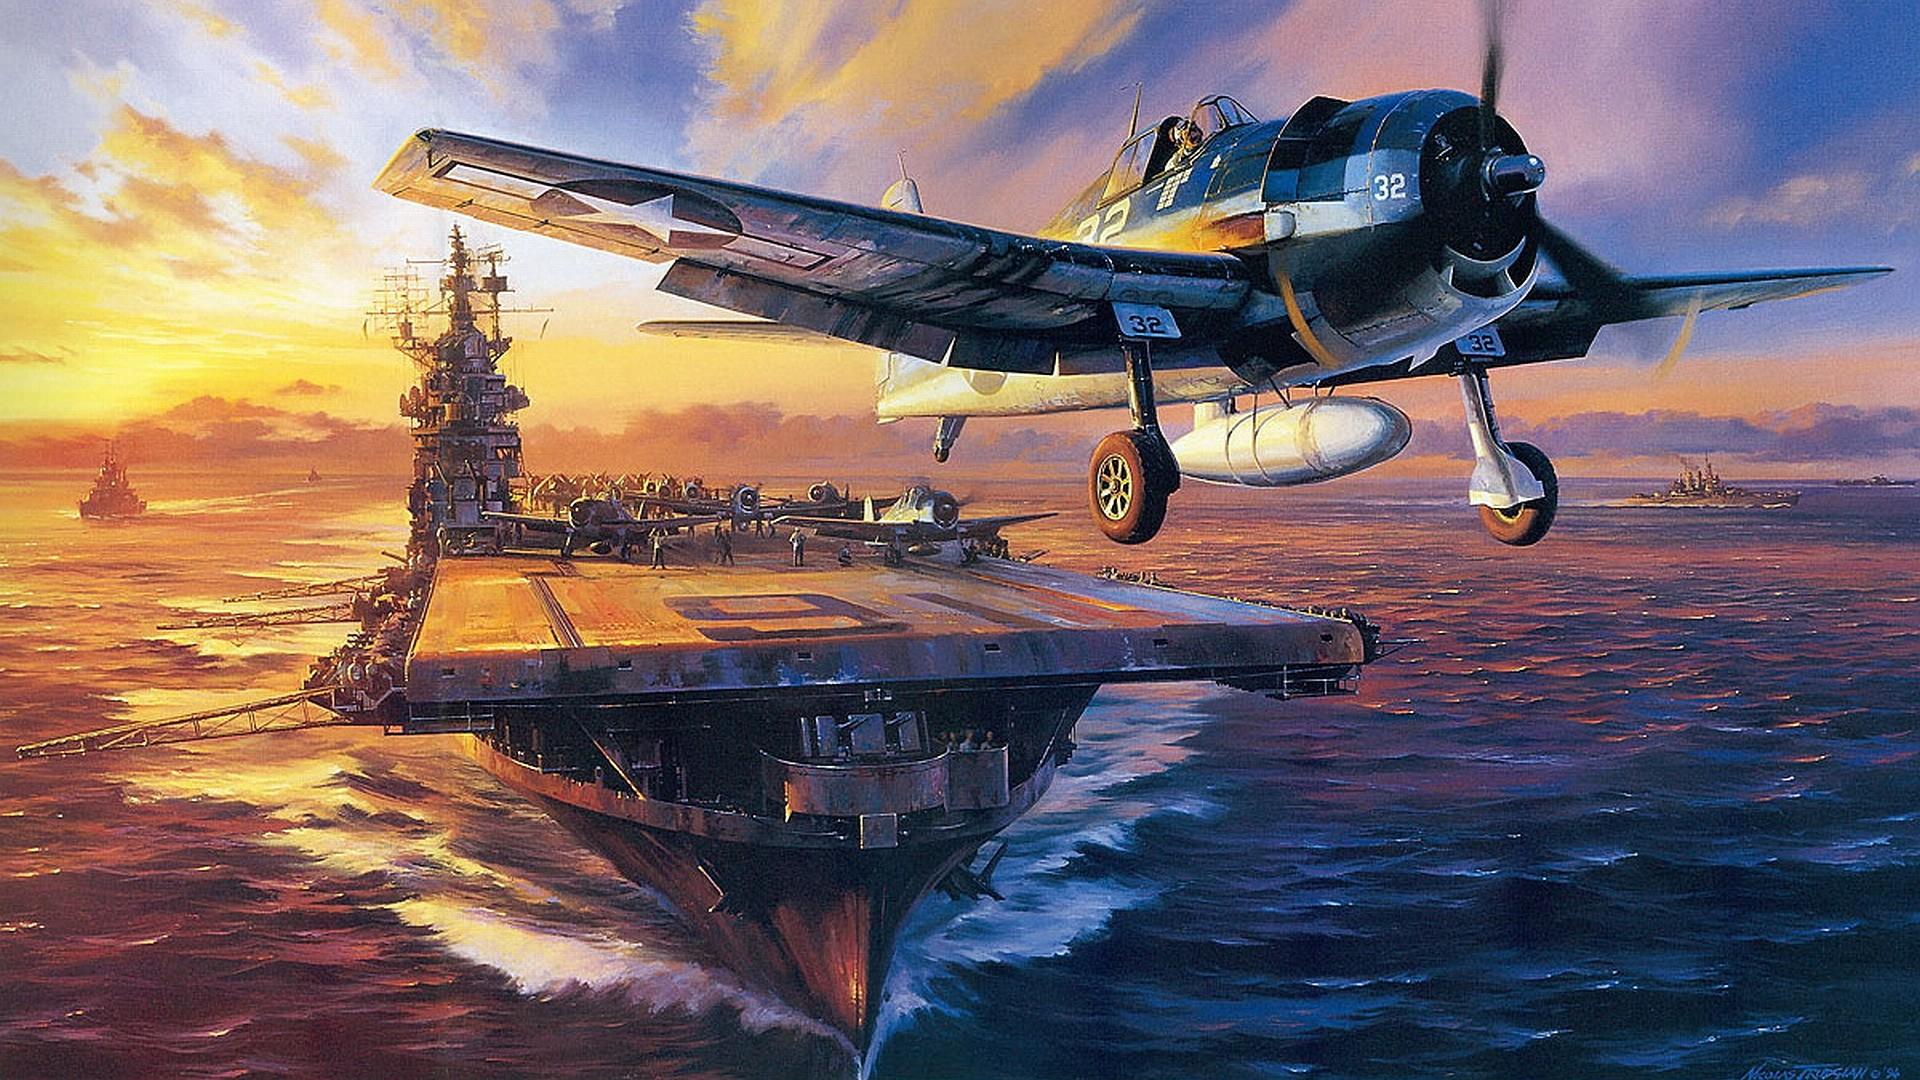 Vintage Aviation Wallpaper Desktop Background #rrxt px 1.59 MB  VehiclesPhotography. Ww2. Aviation